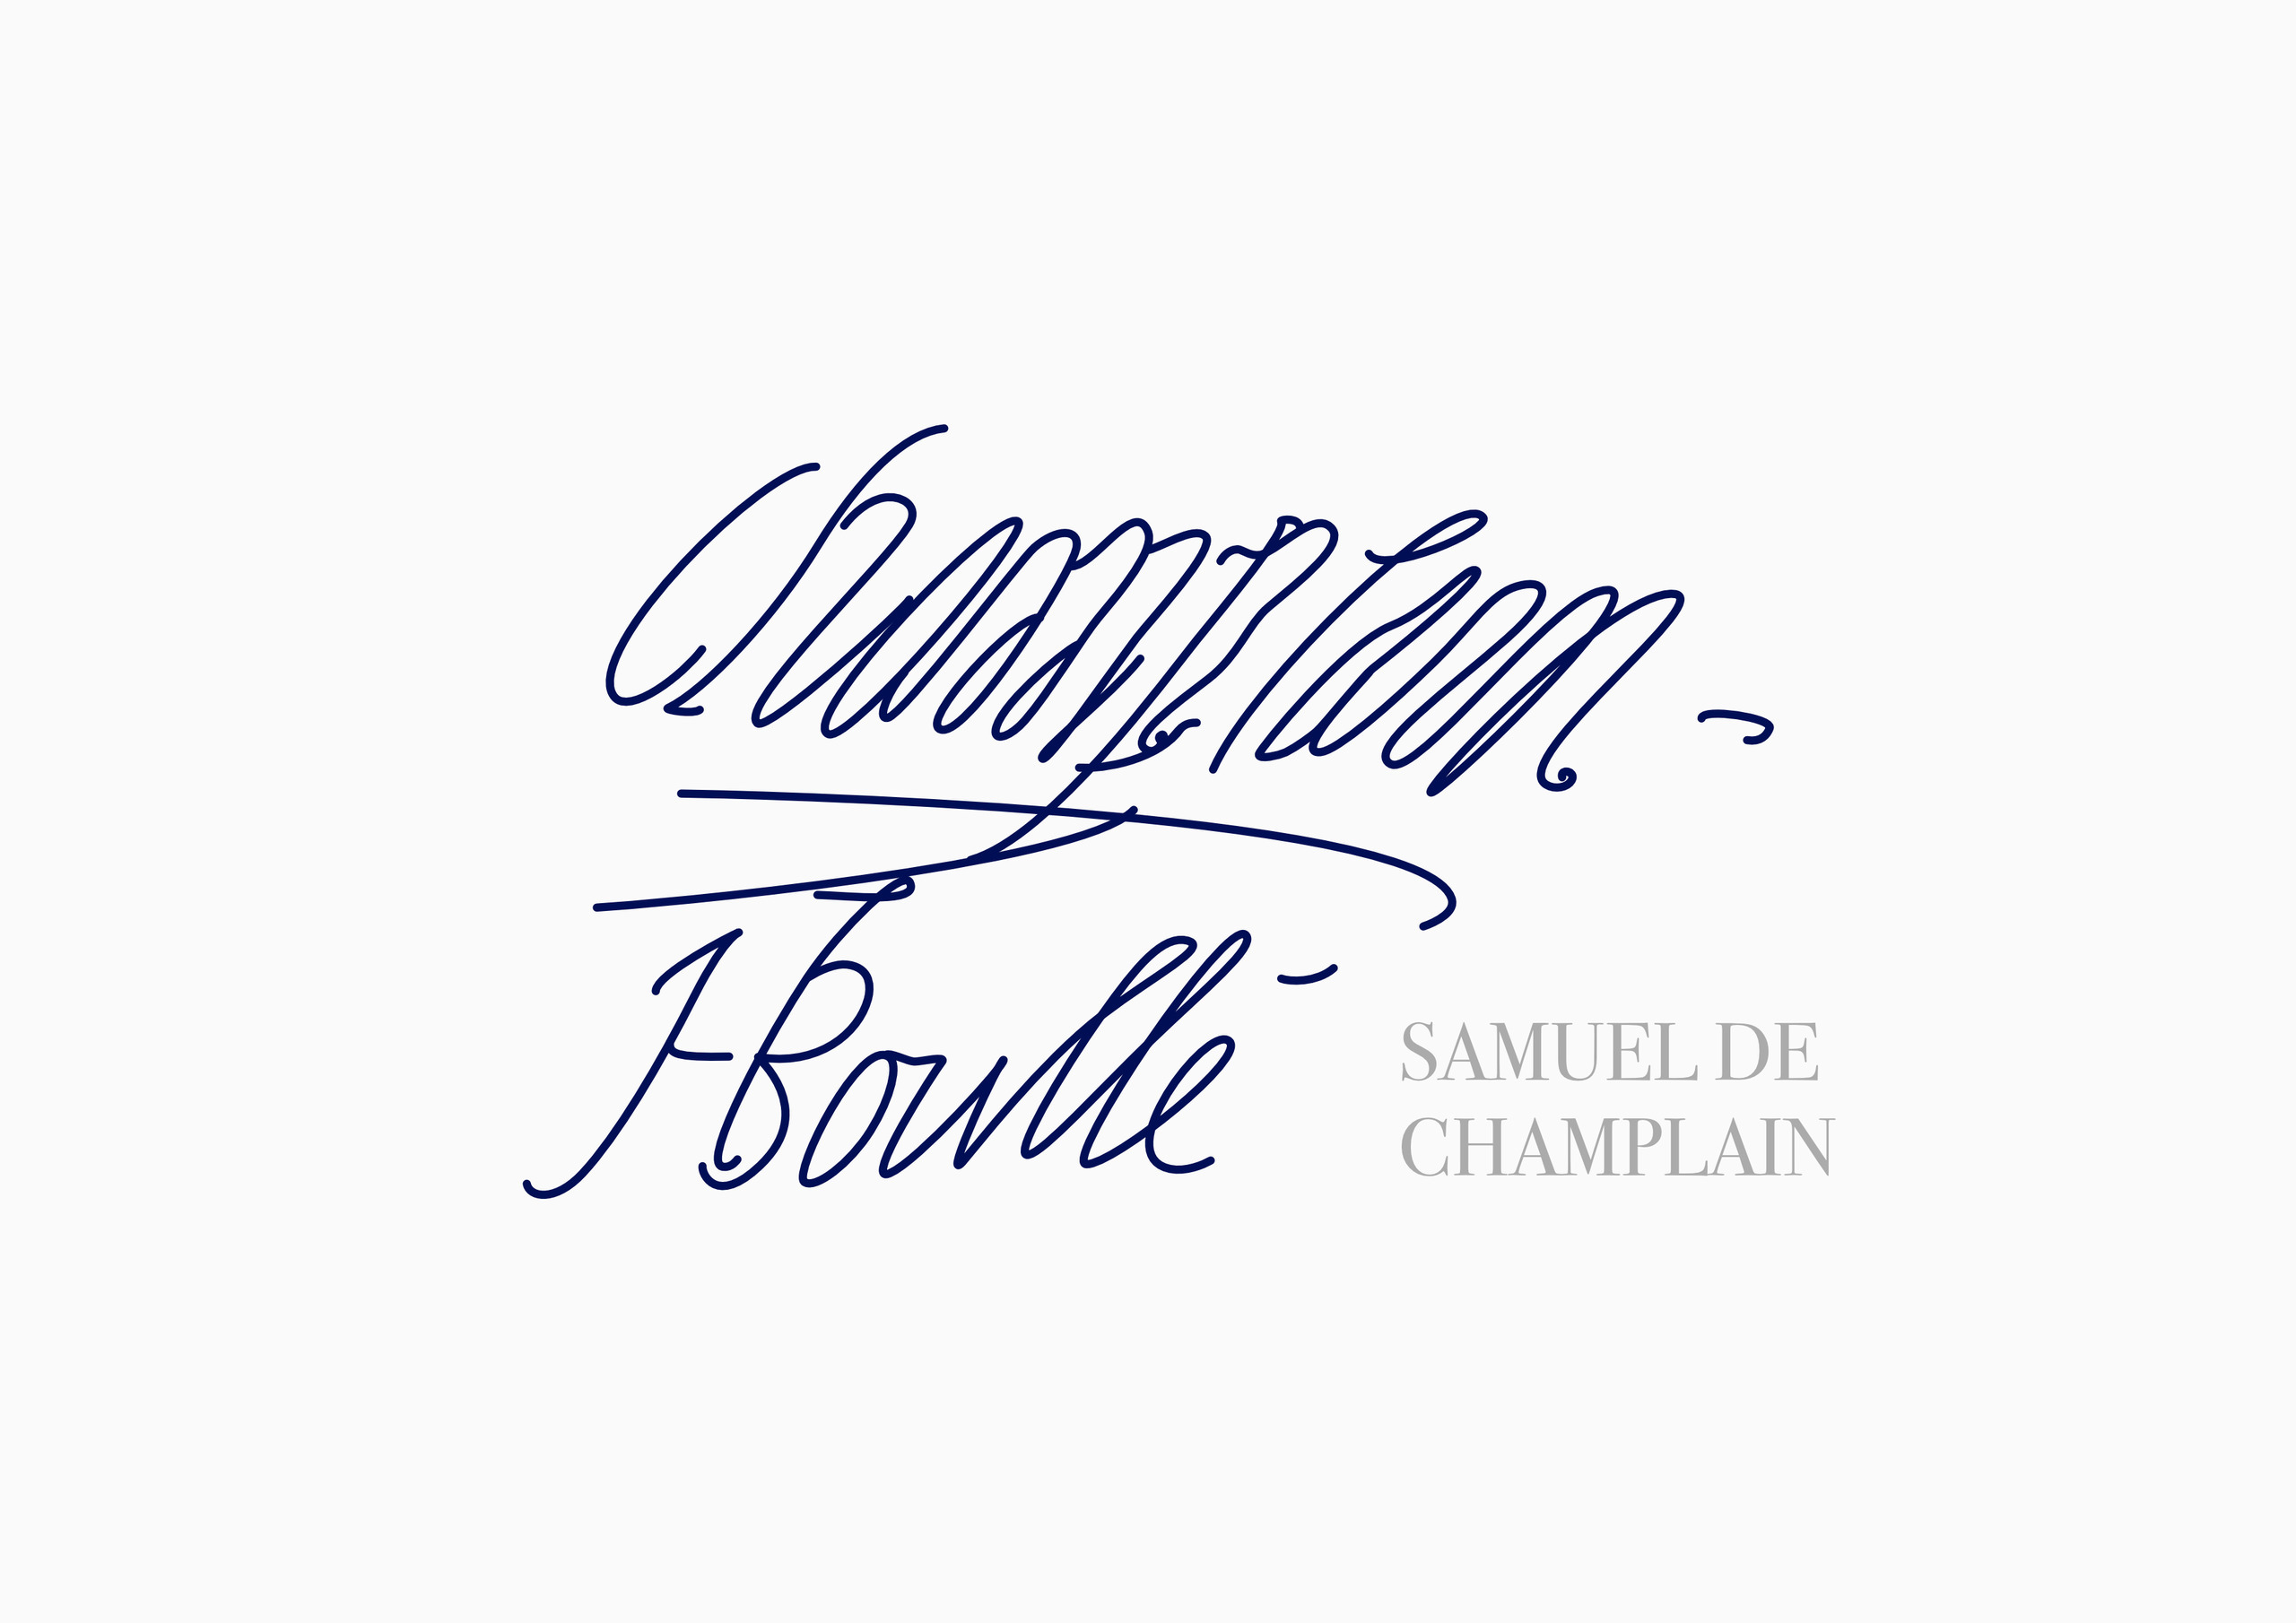 champlon.png